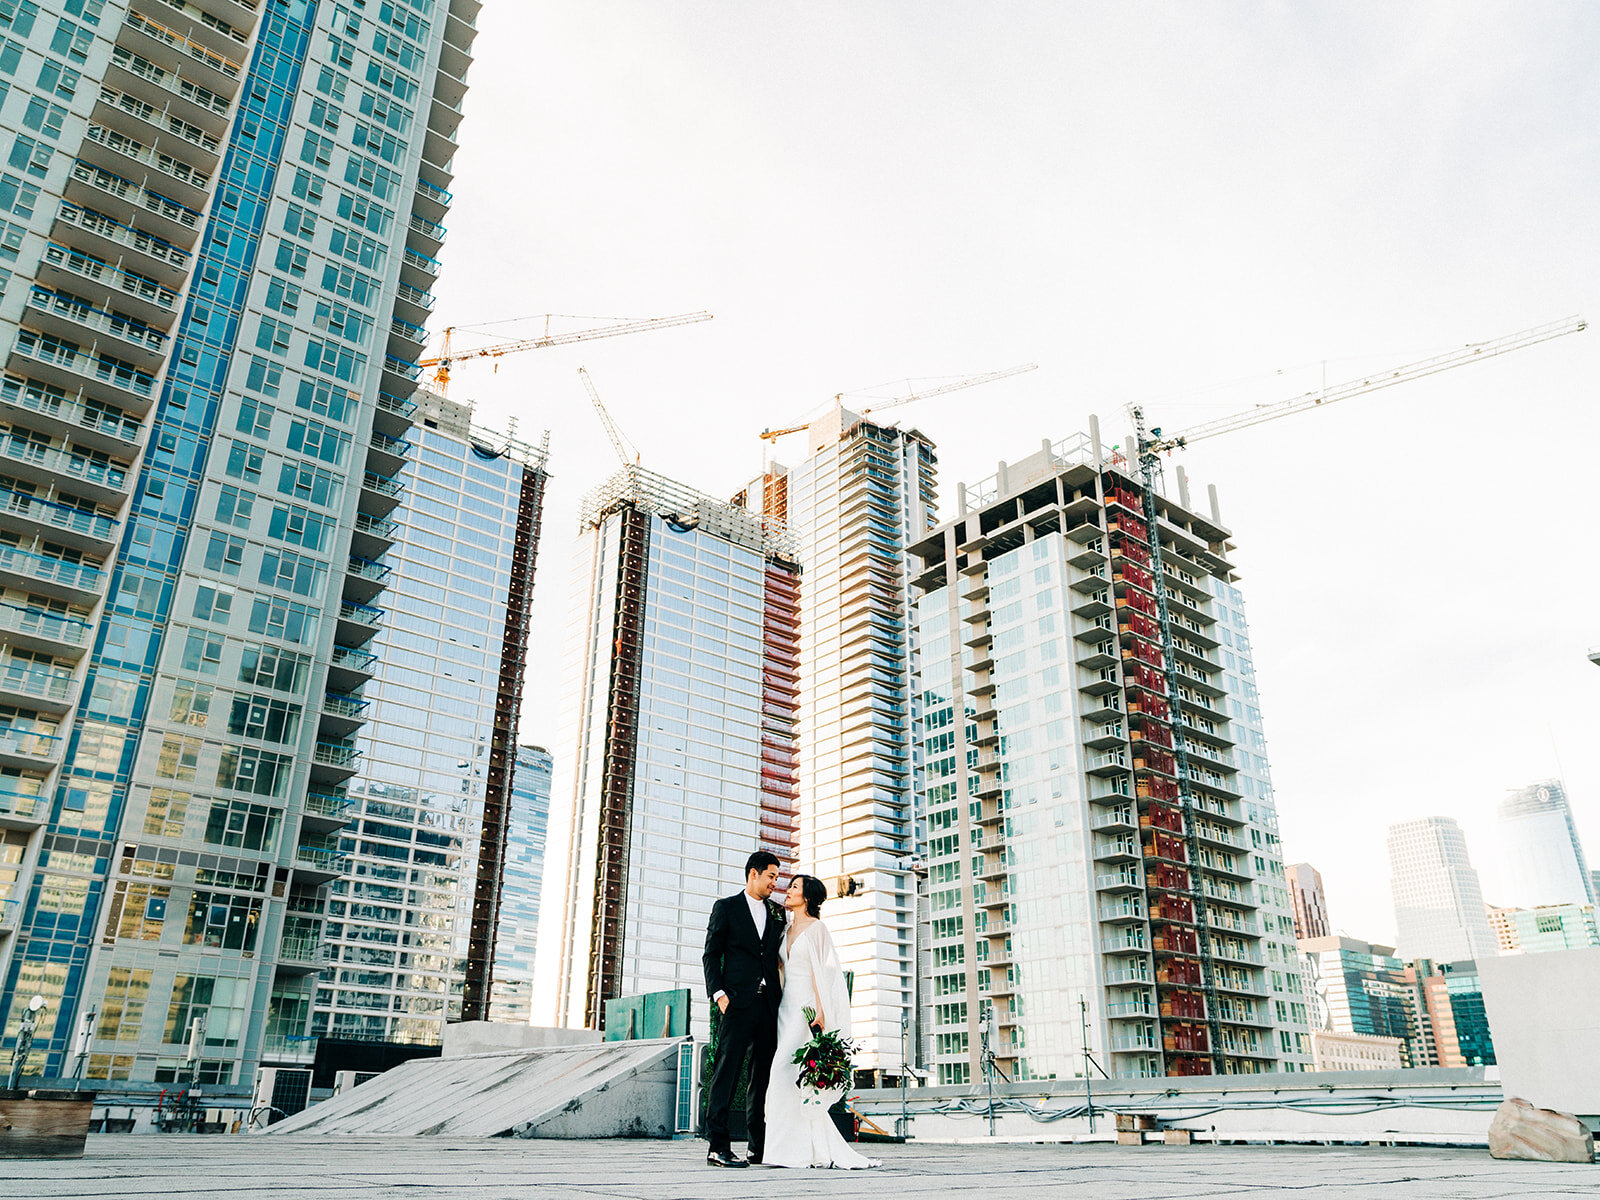 Tom-and-Christine-Hudson-Loft-Downtown-Los-Angeles-Brandon-J-Ferlin-Wedding-Photography-710.jpg